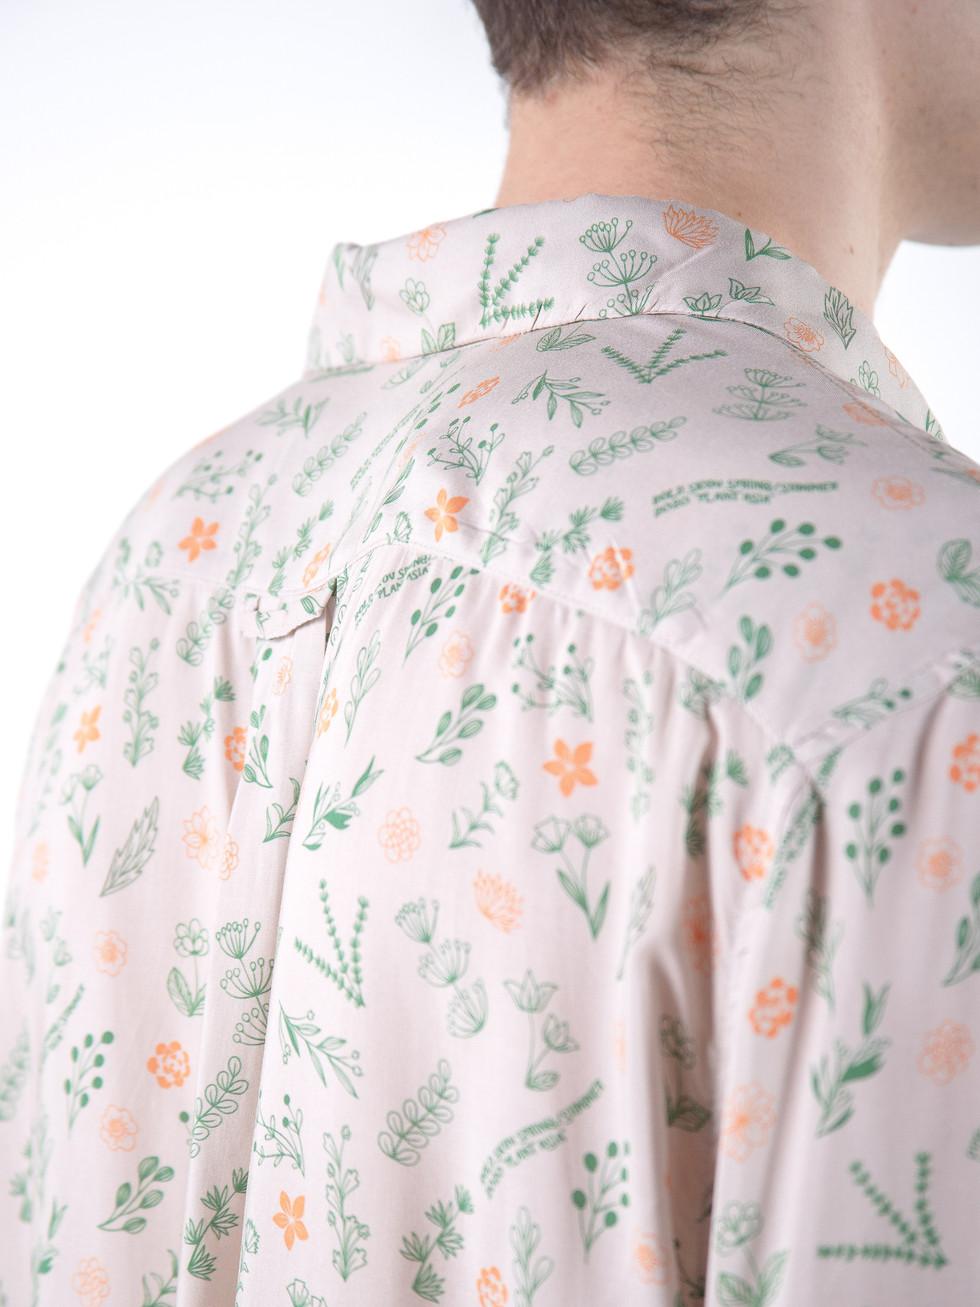 09_rold_skov_ss20_plantasia_shirt-13.jpg